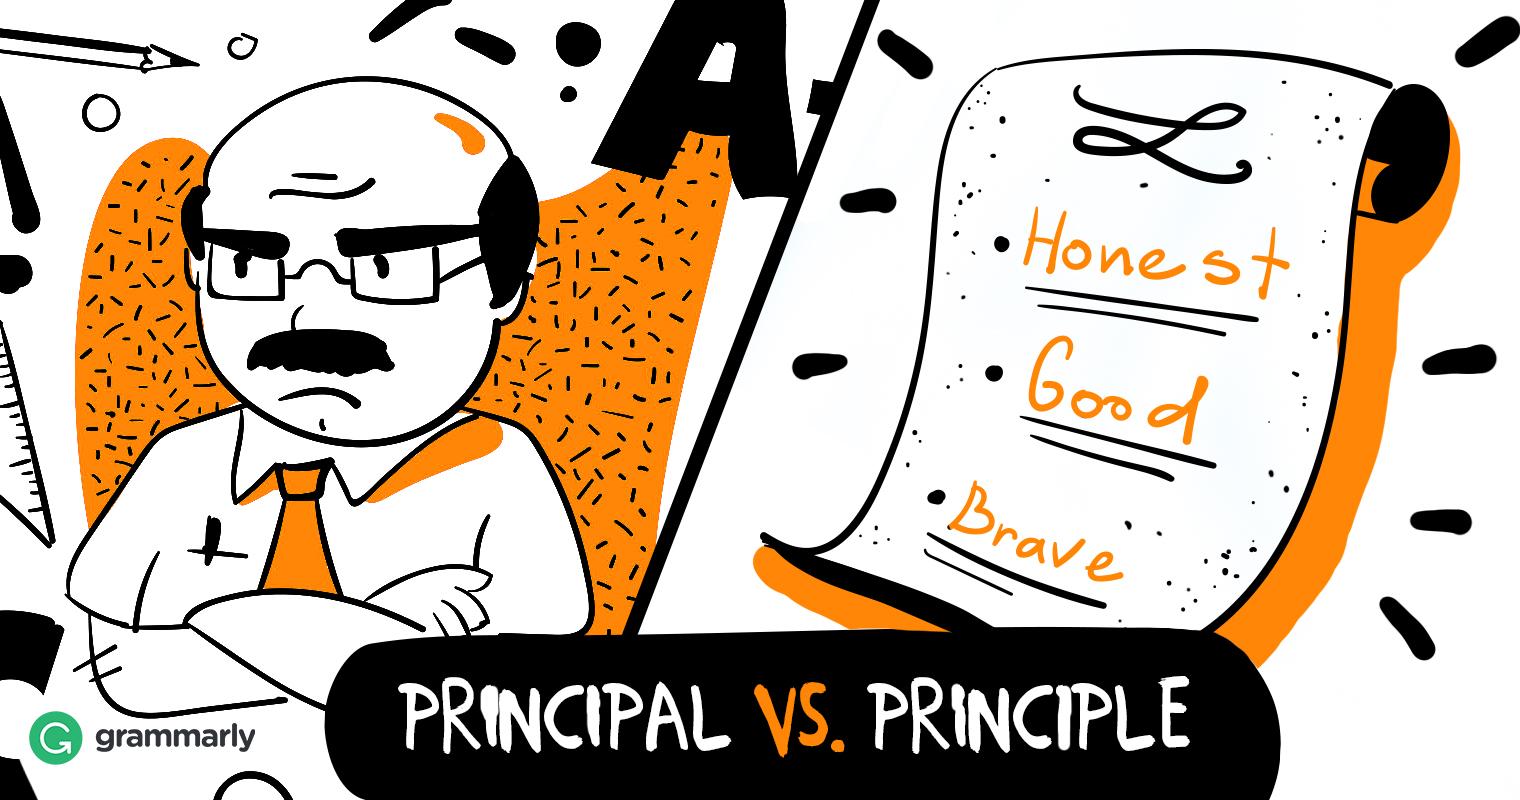 Principal vs. Principle.